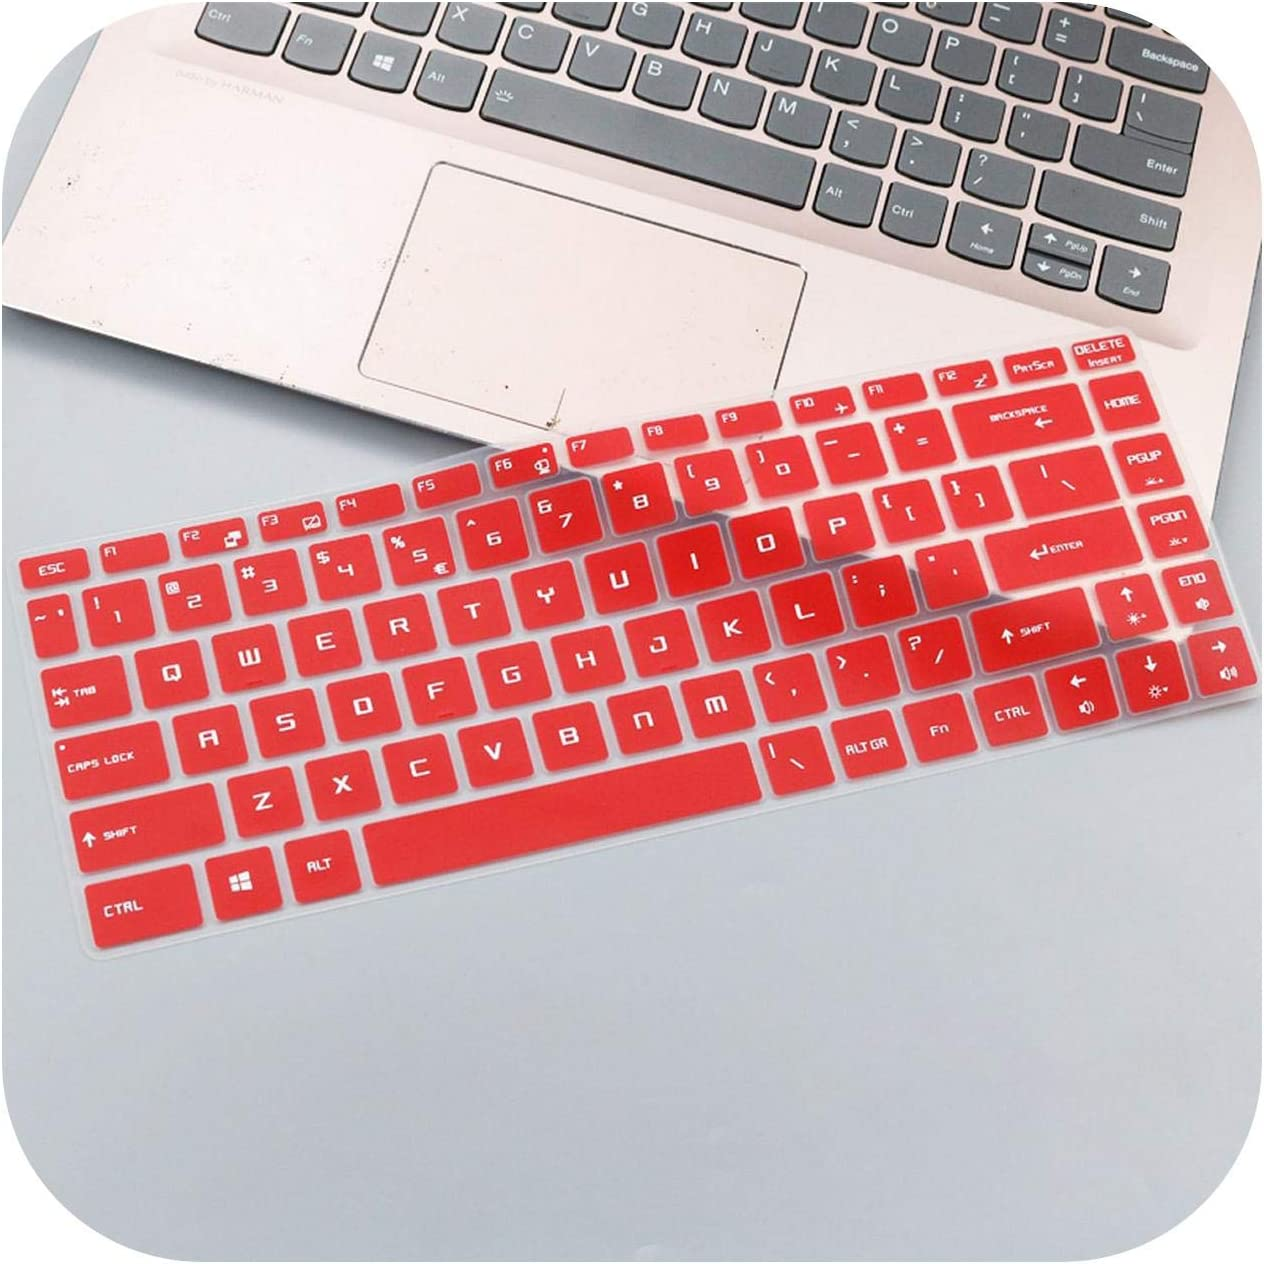 15,6 pulgadas Gaming Laptop Keyboard Keyboard Keyboard Skin Cover for 15.6 Msi Gs65 Gf63 P65 Ps42 Ps63 8Rd 8Re 8Rb 8Rcx 8Re 014Cn talla /única negro